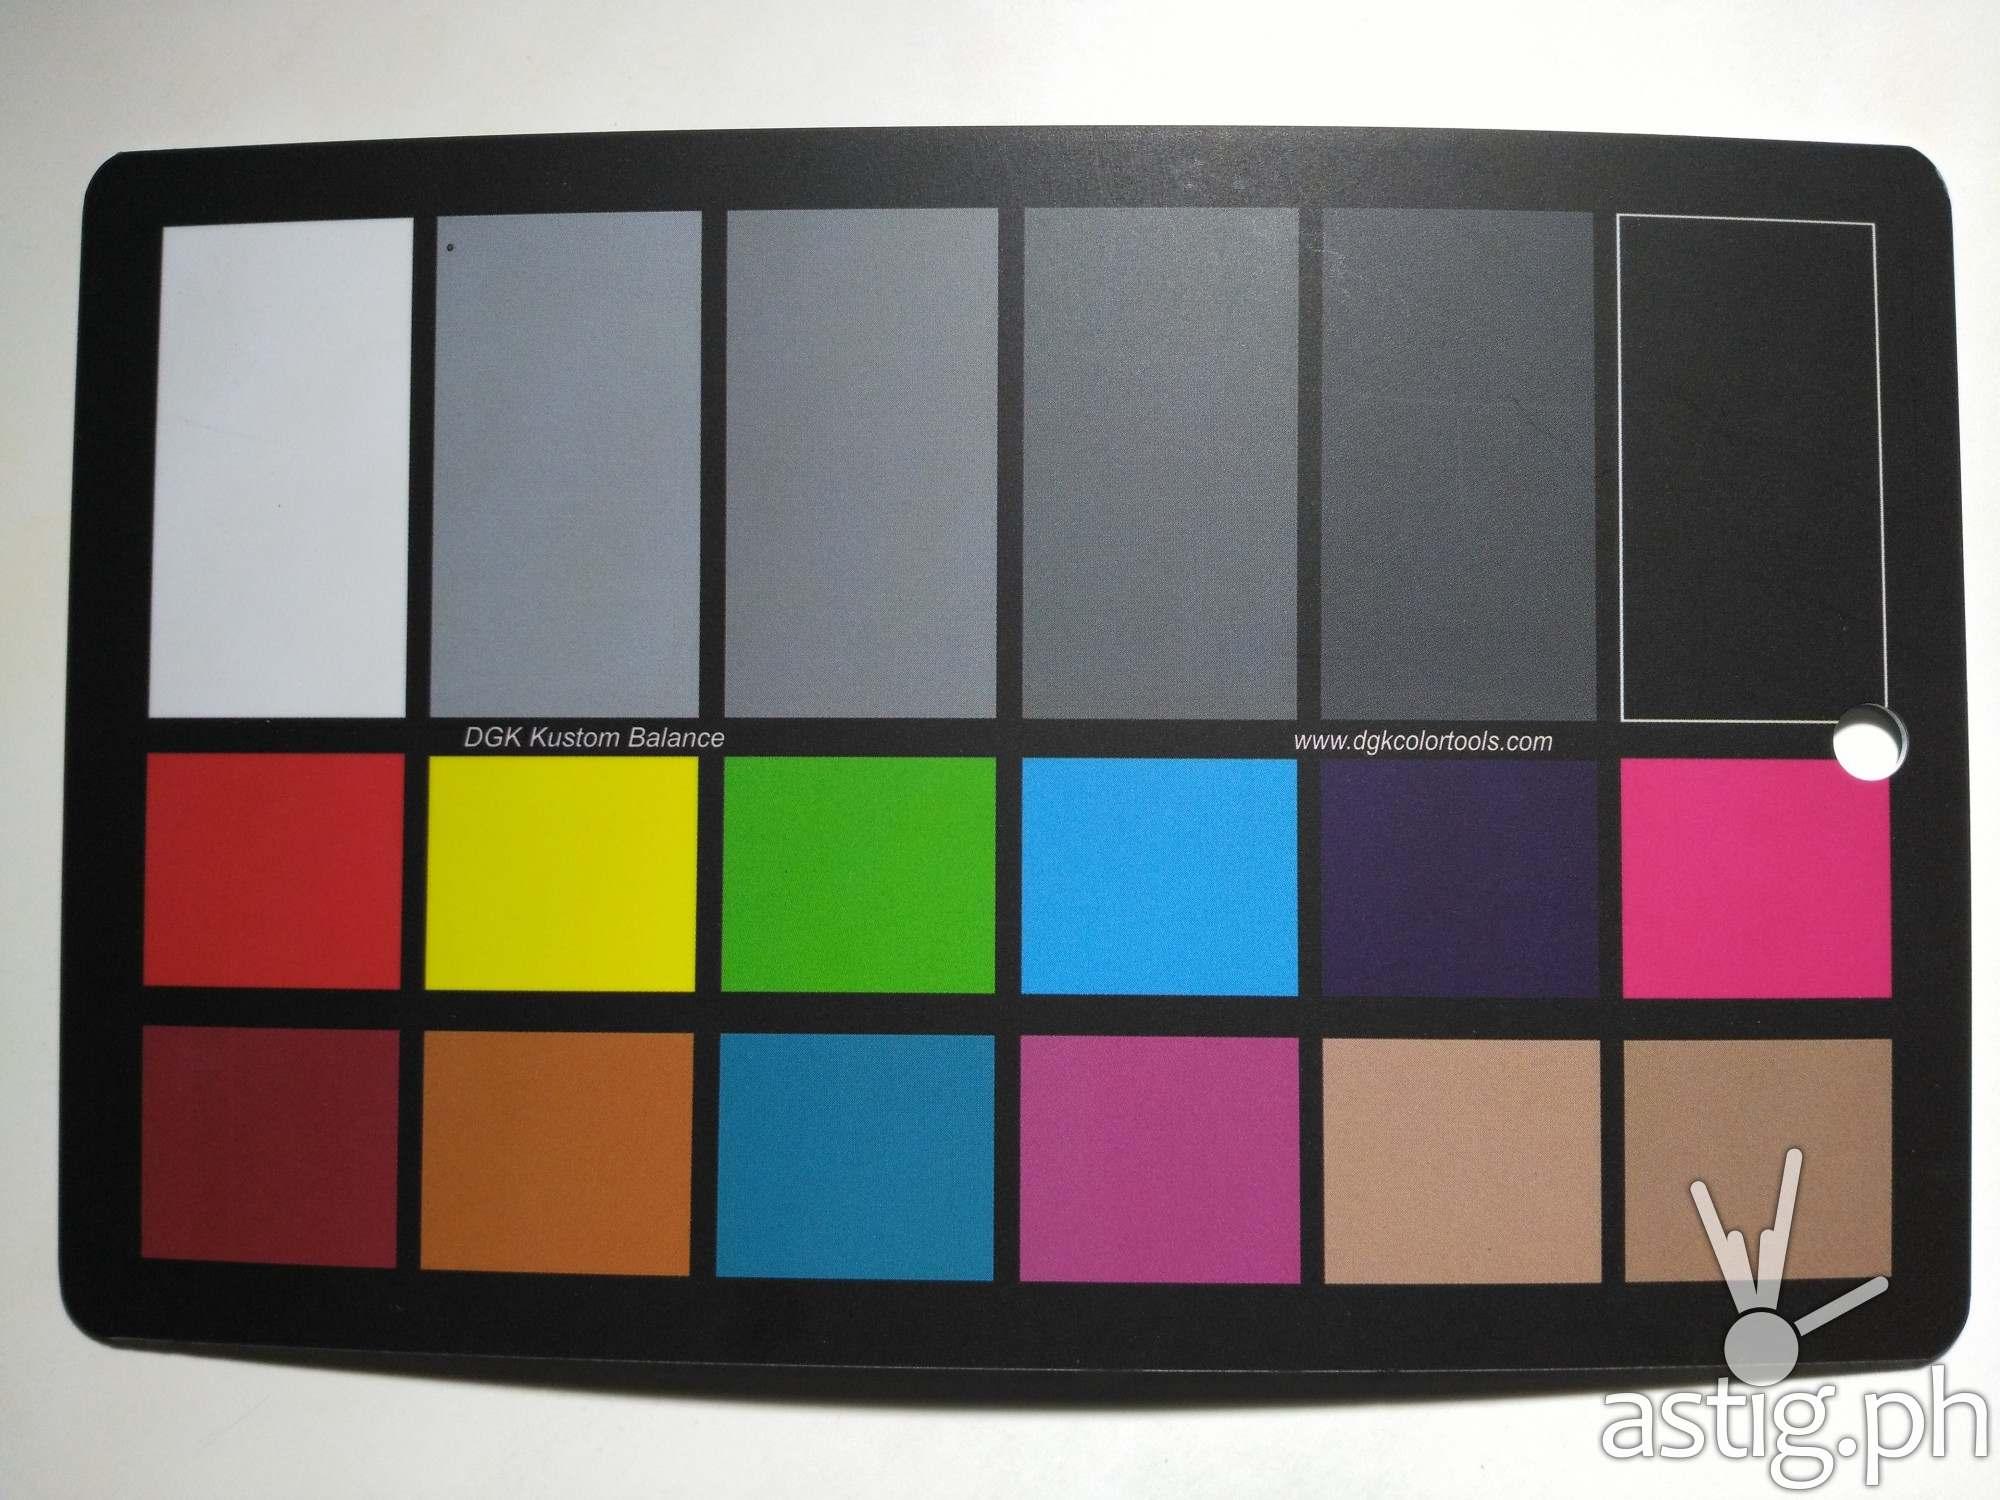 Huawei GR5 sample photo f/2 ISO 100